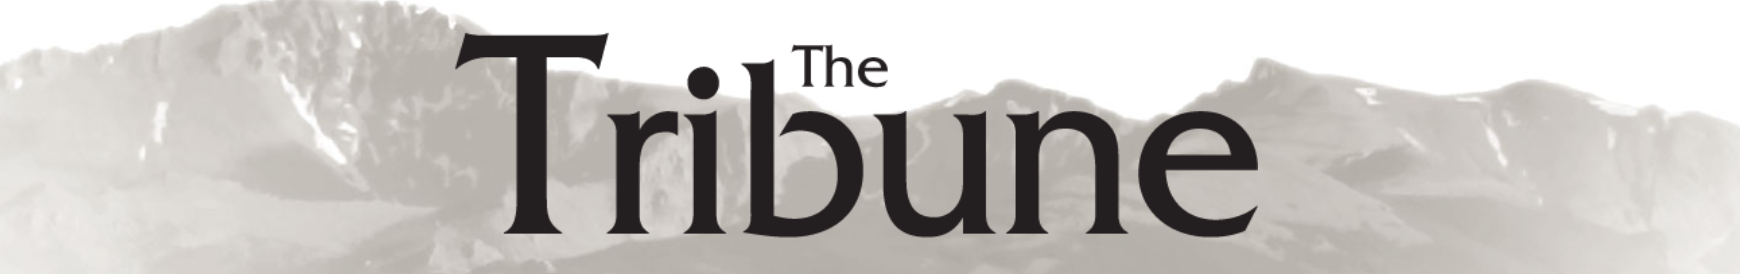 The Tribune Cassandra Estelle Debutante Colorado.png